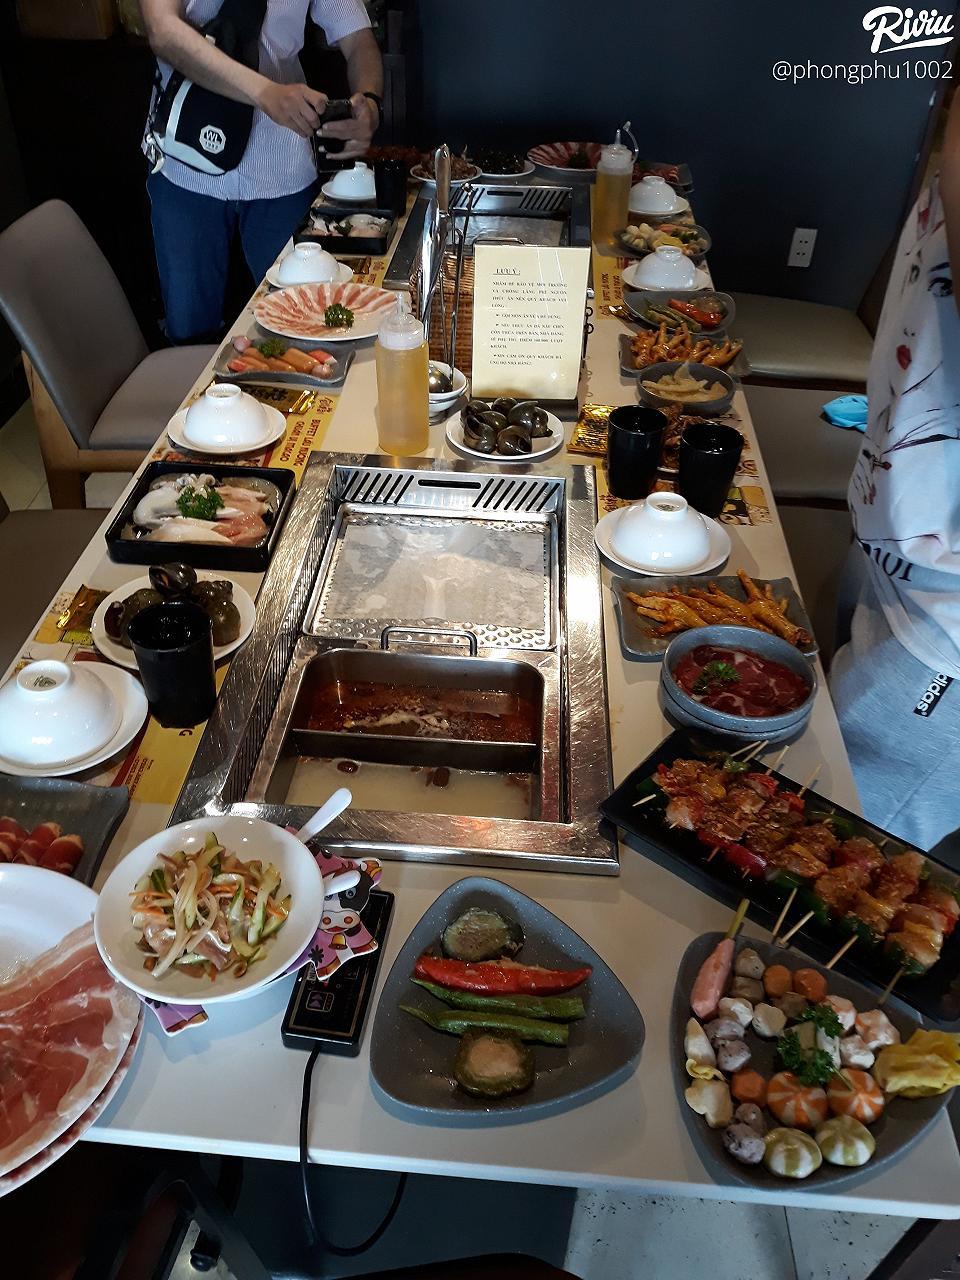 10* cho buffet lau nuong 180k sik dak food - anh 2